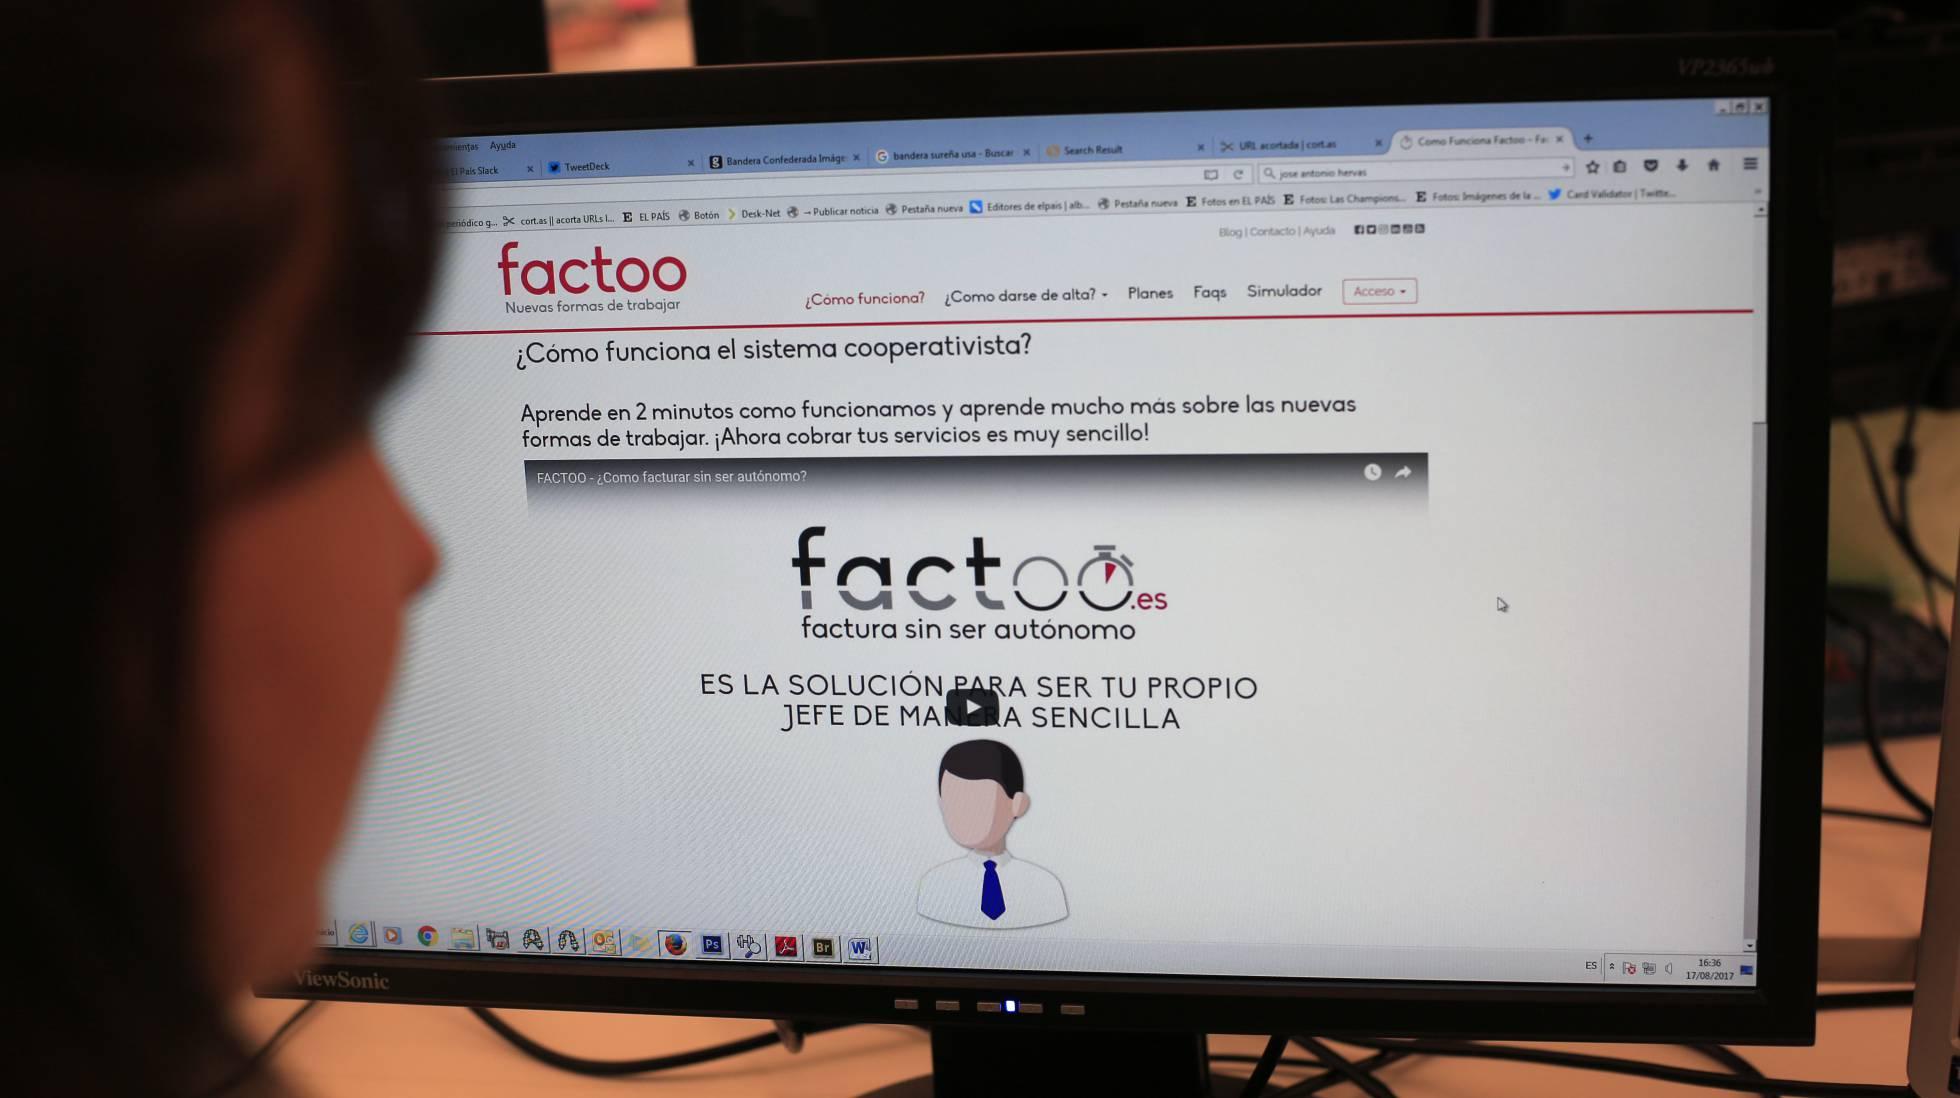 Una usuaria de la empresa Factoo ve su página web